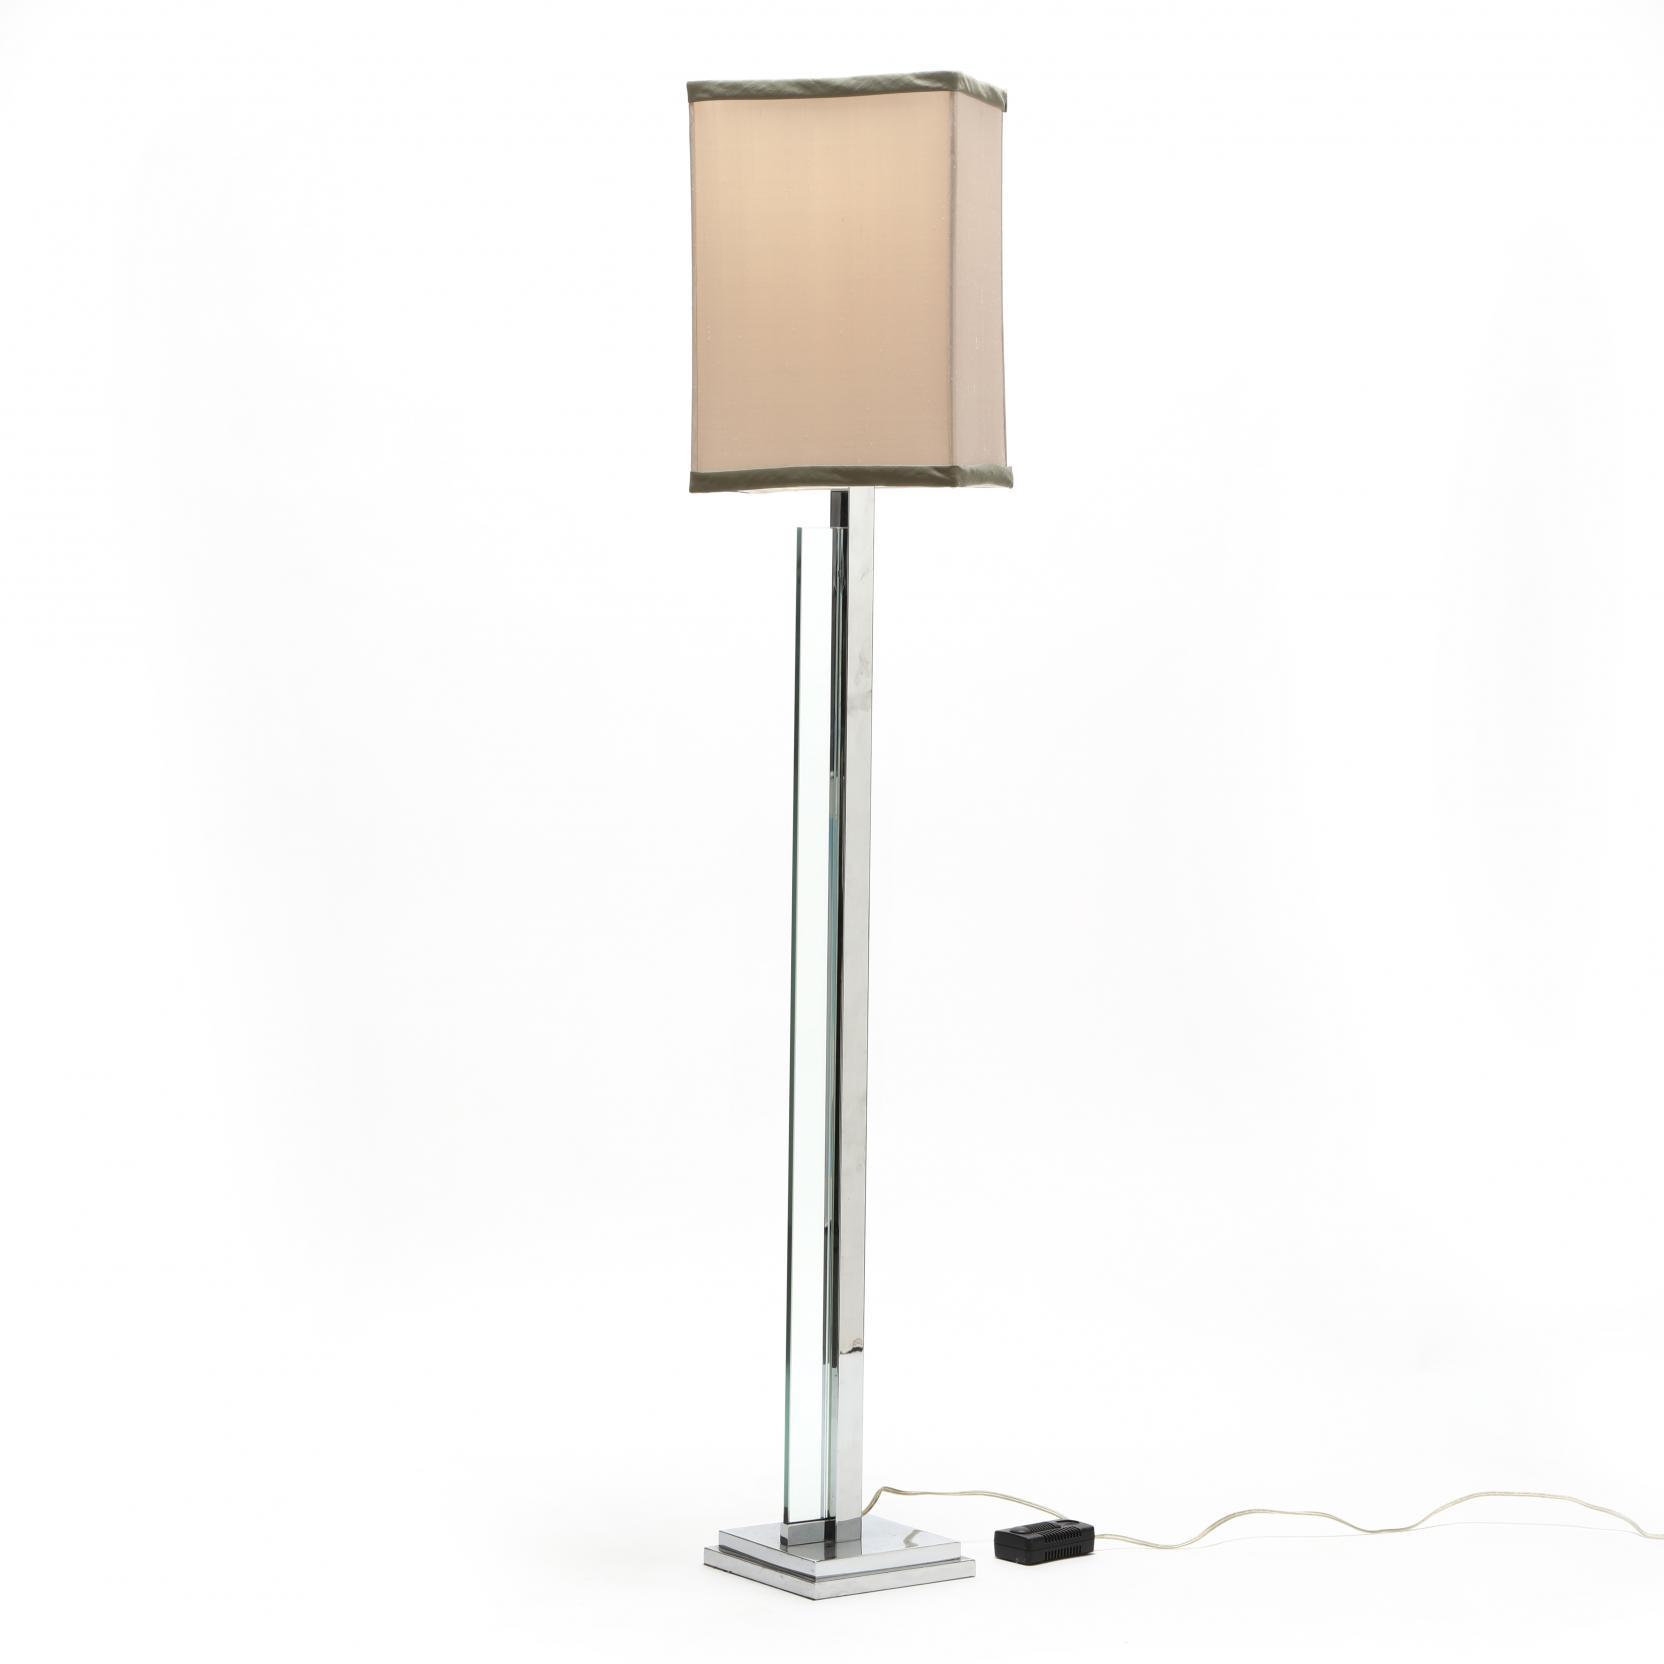 modernist-chrome-and-glass-floor-lamp